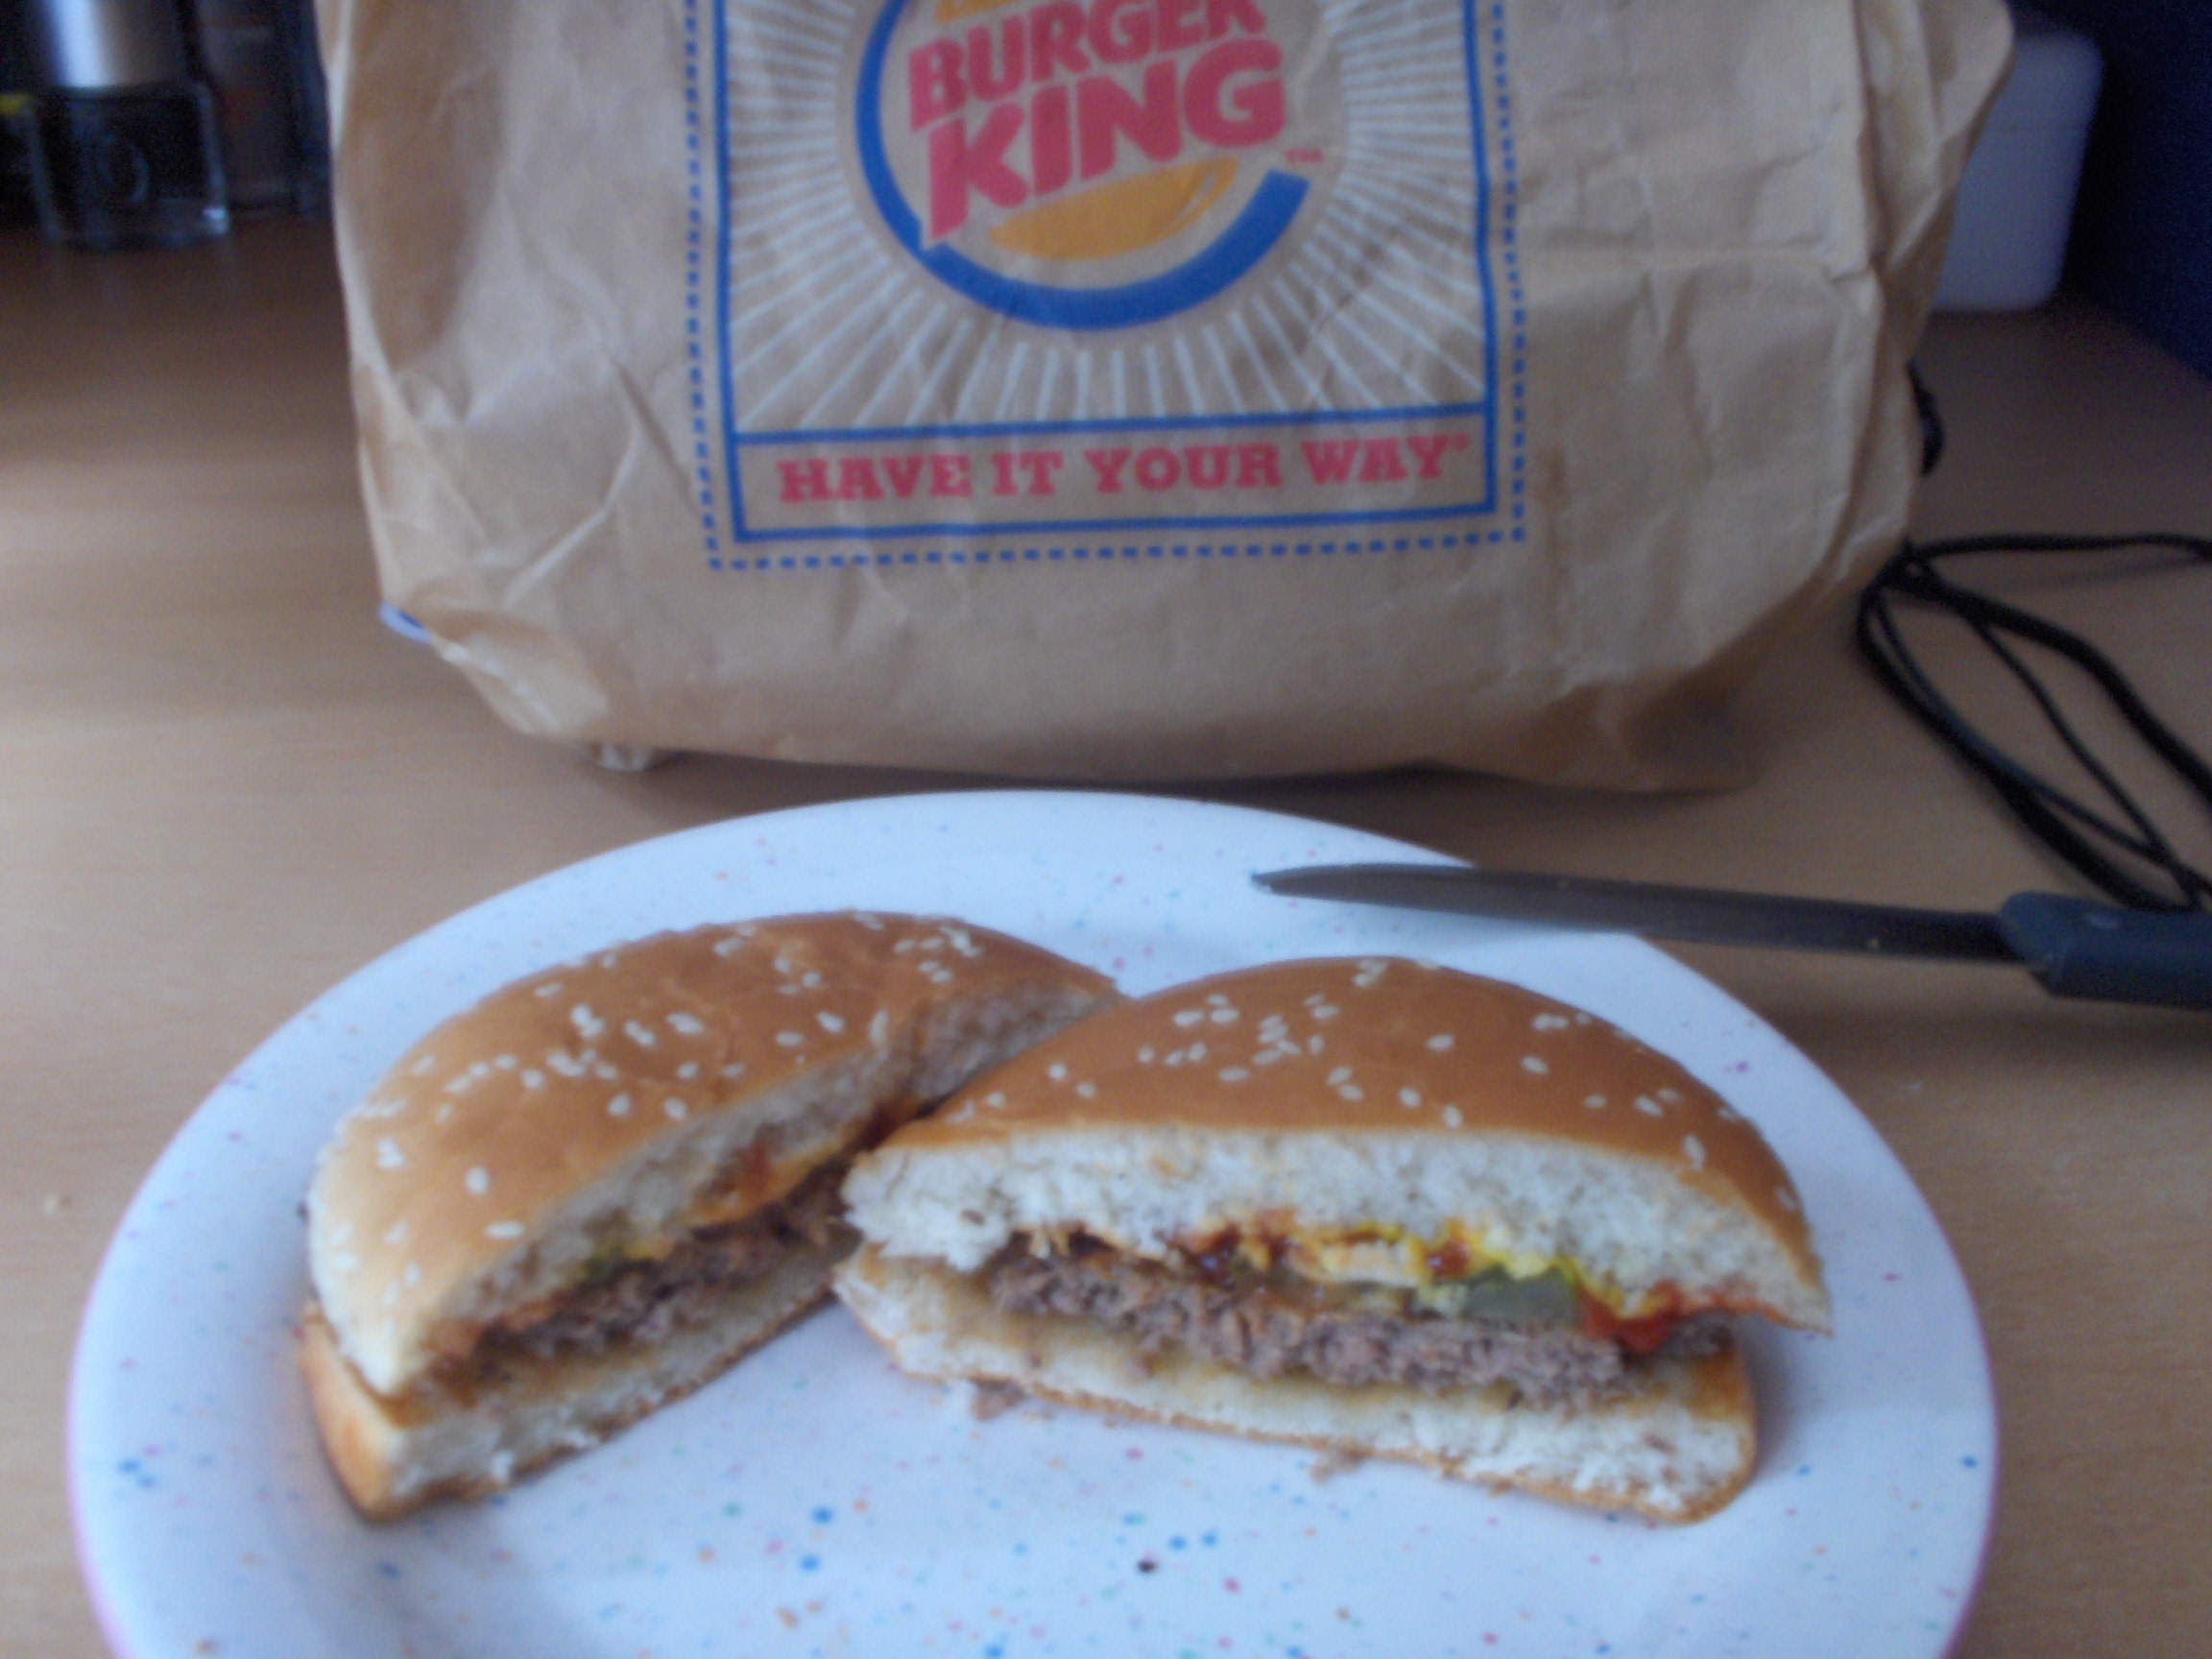 https://foodloader.net/s3Rax_2008-01-04_BurgerKing2.jpg